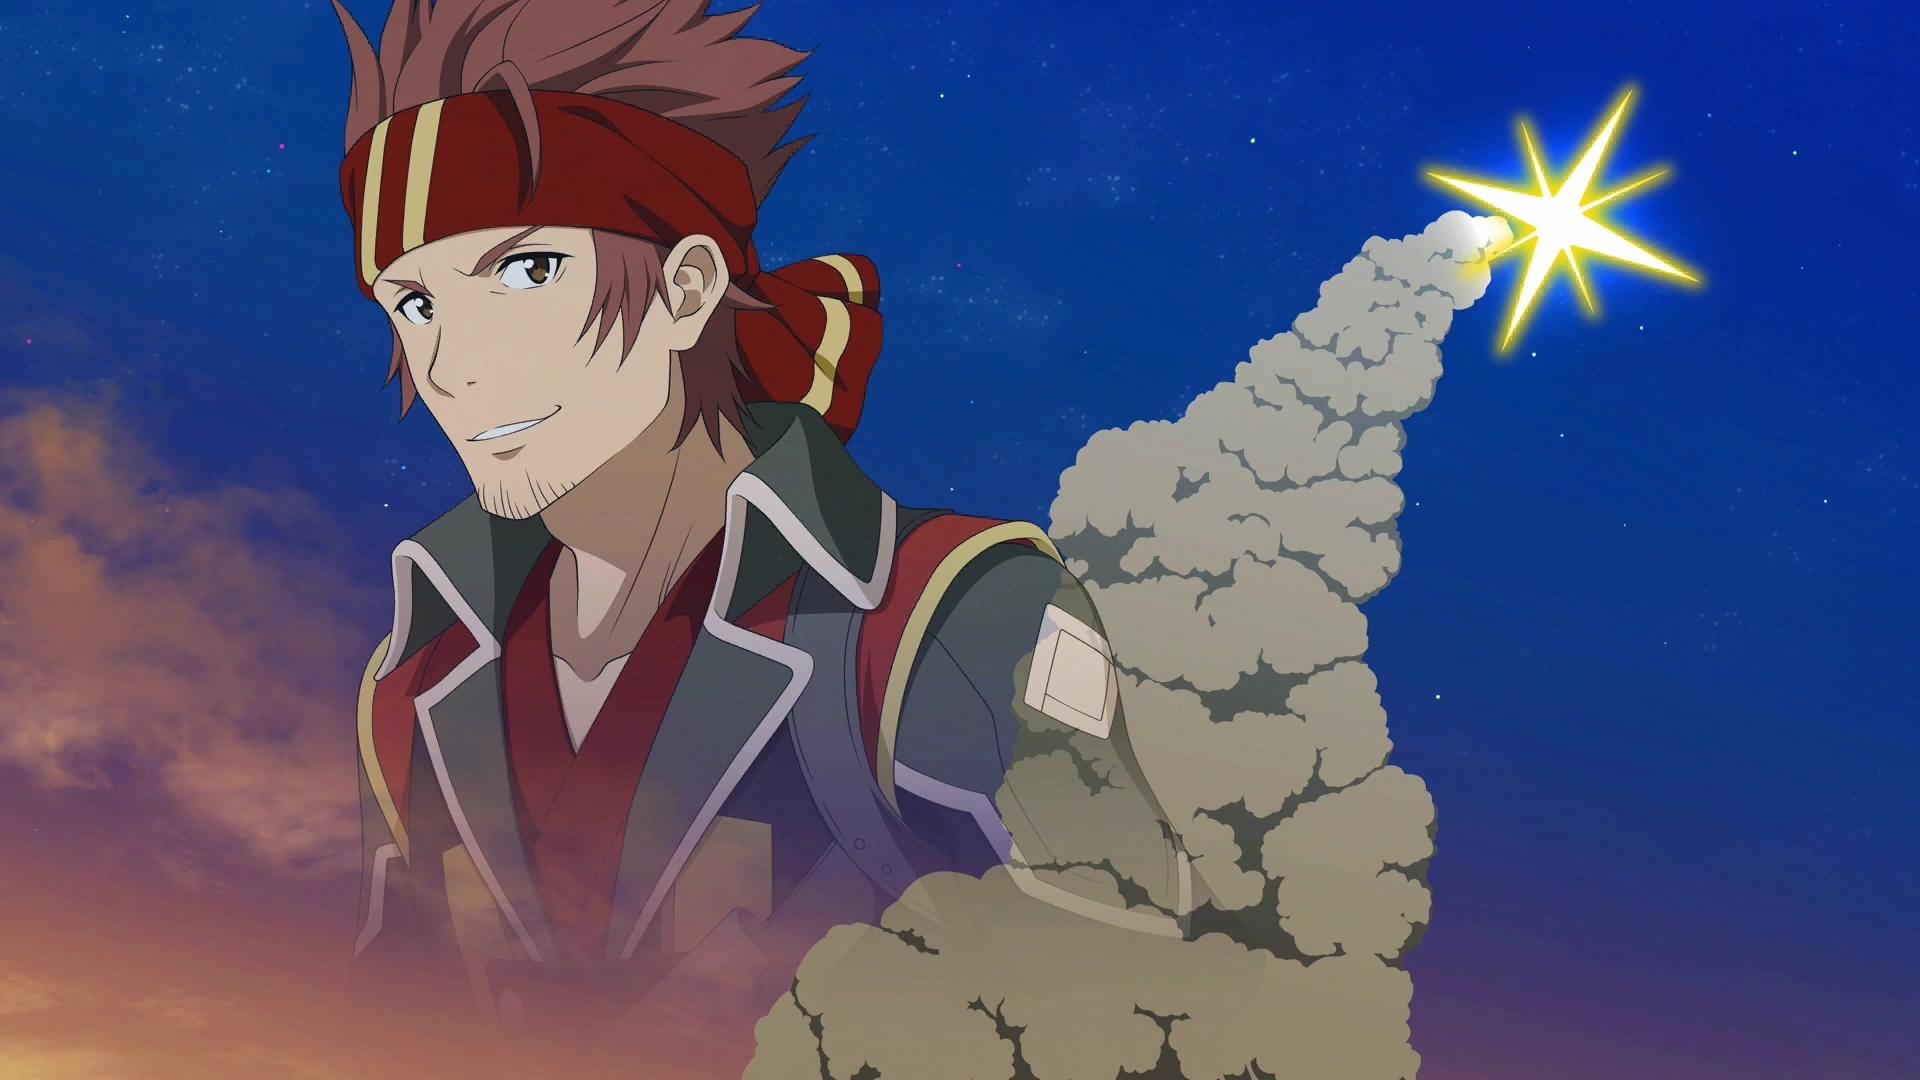 Klein Ggo Tsuboi Ryoutarou Image 2280896 Zerochan Anime Image Board